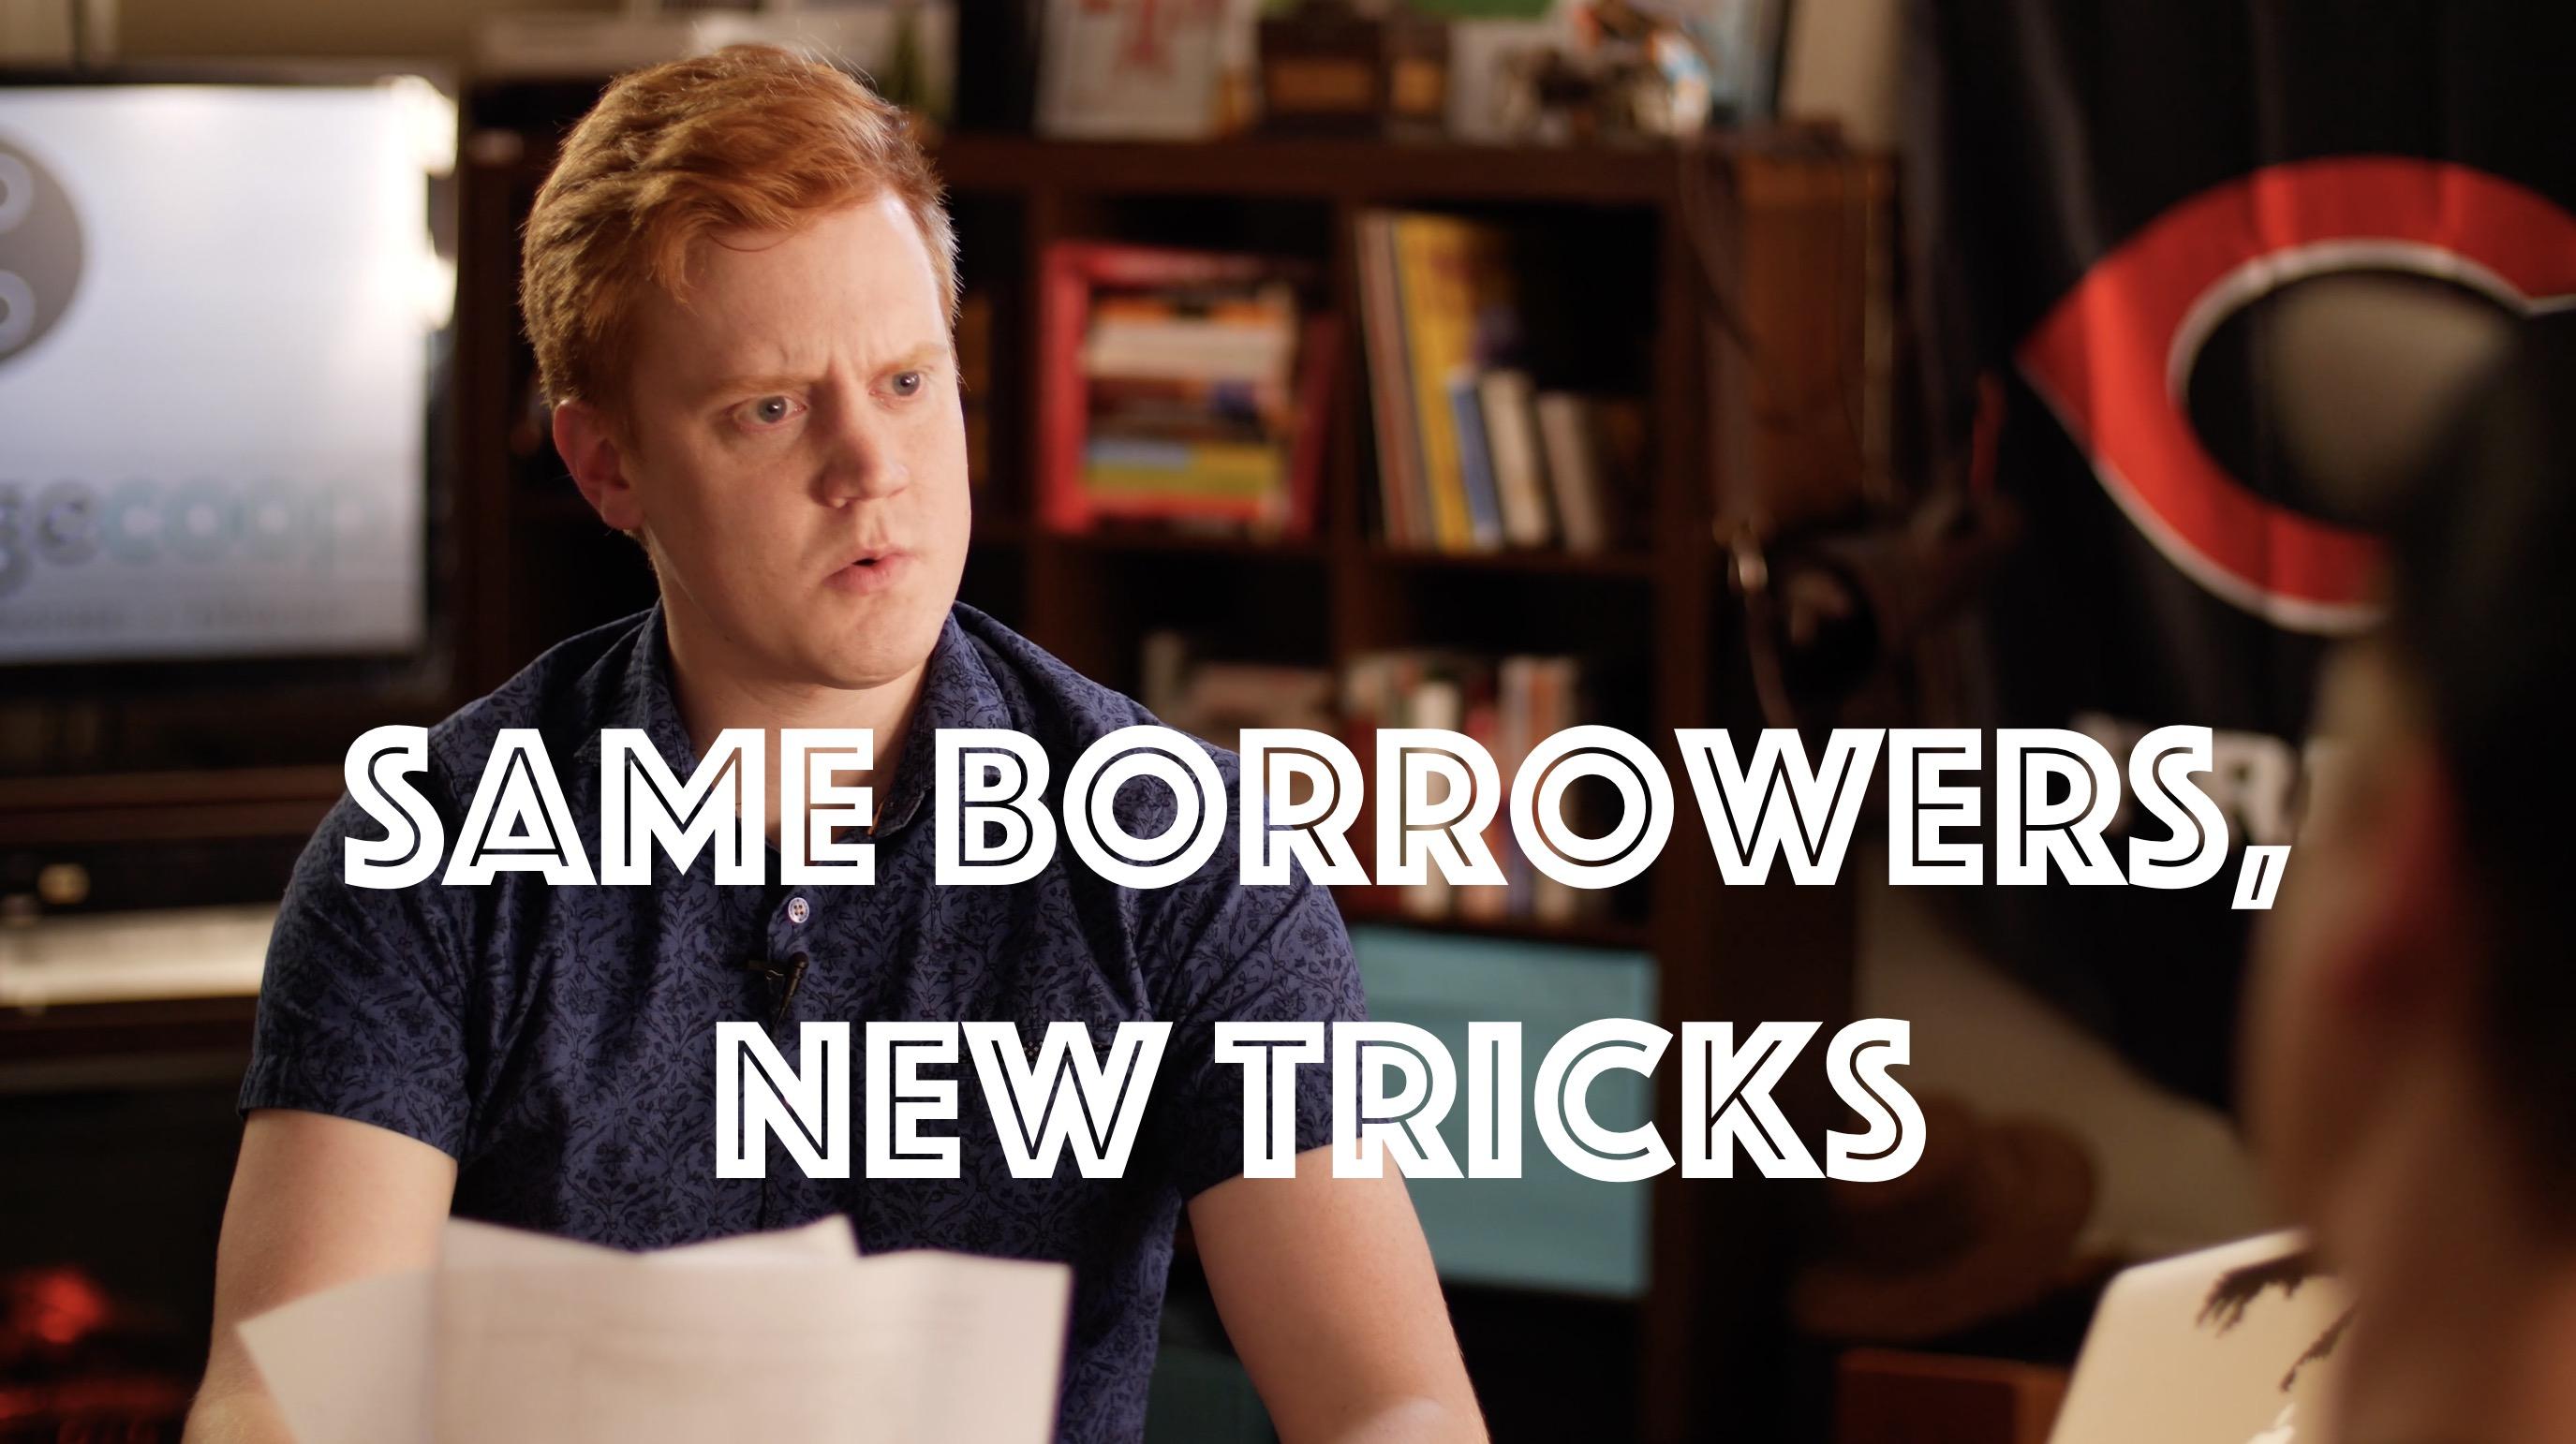 Same Borrowers, New Tricks - Weekly Roundup: September 28, 2018